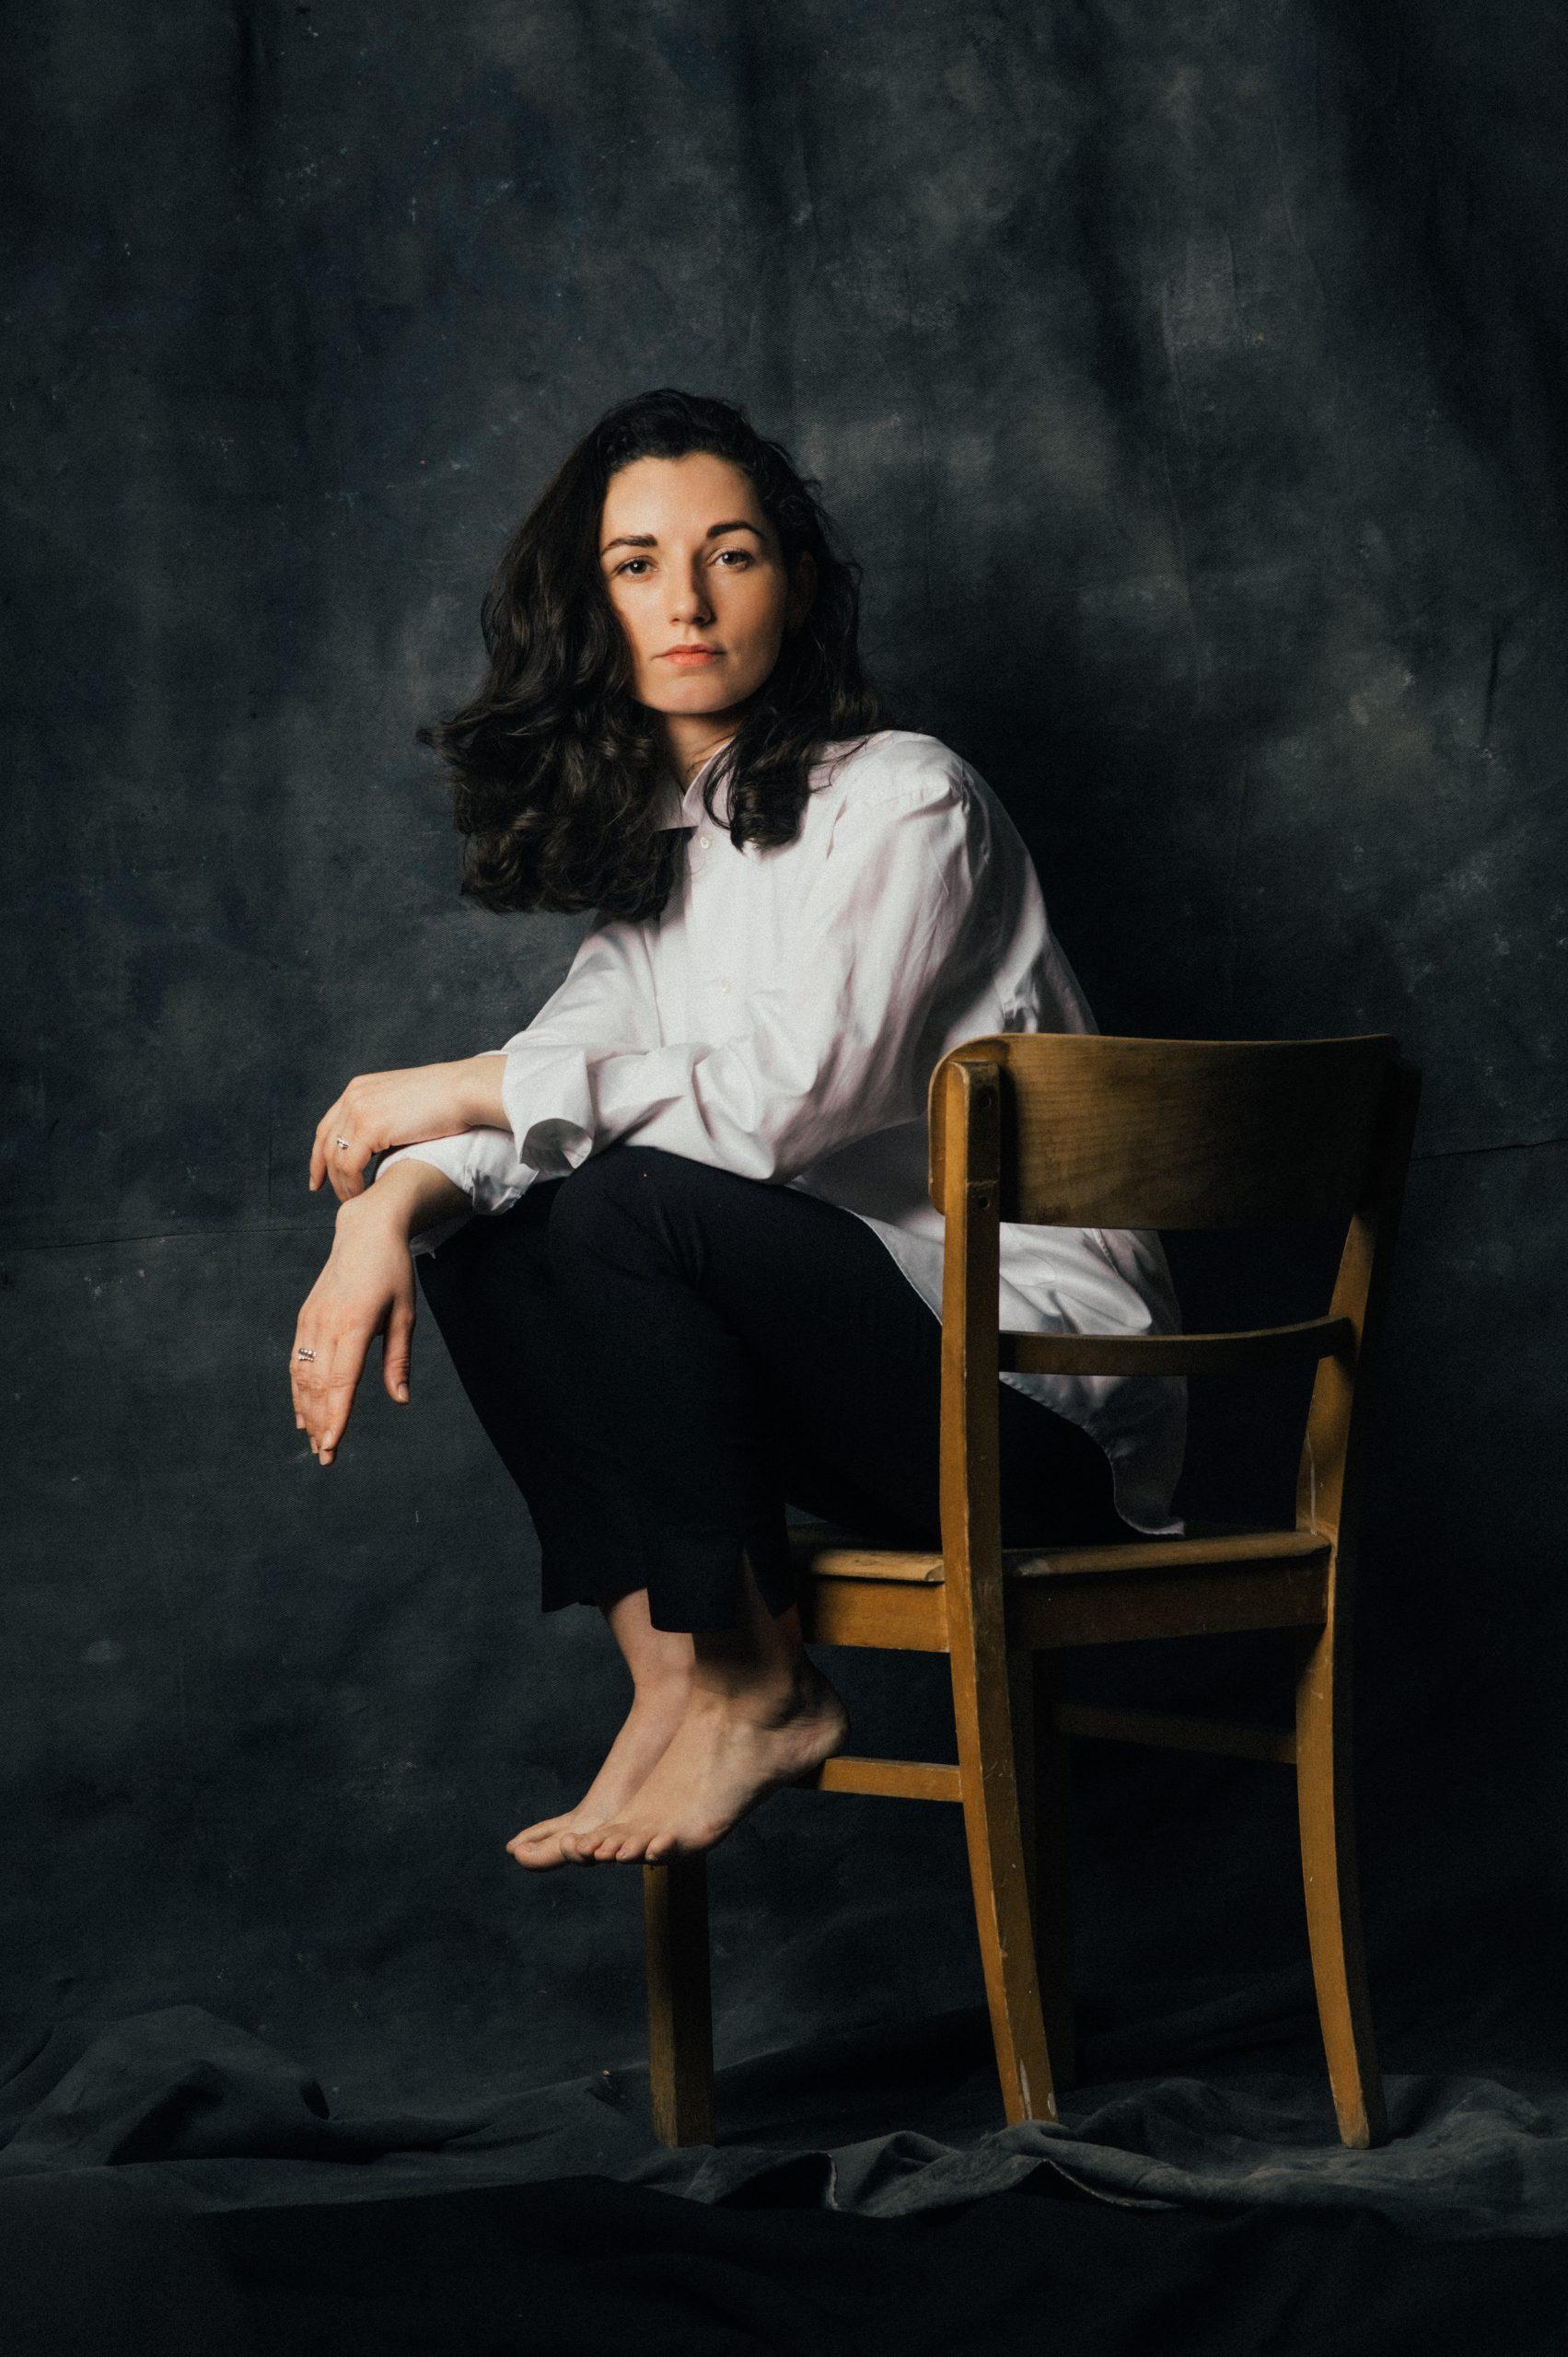 Frau sitzt auf Holzstuhl